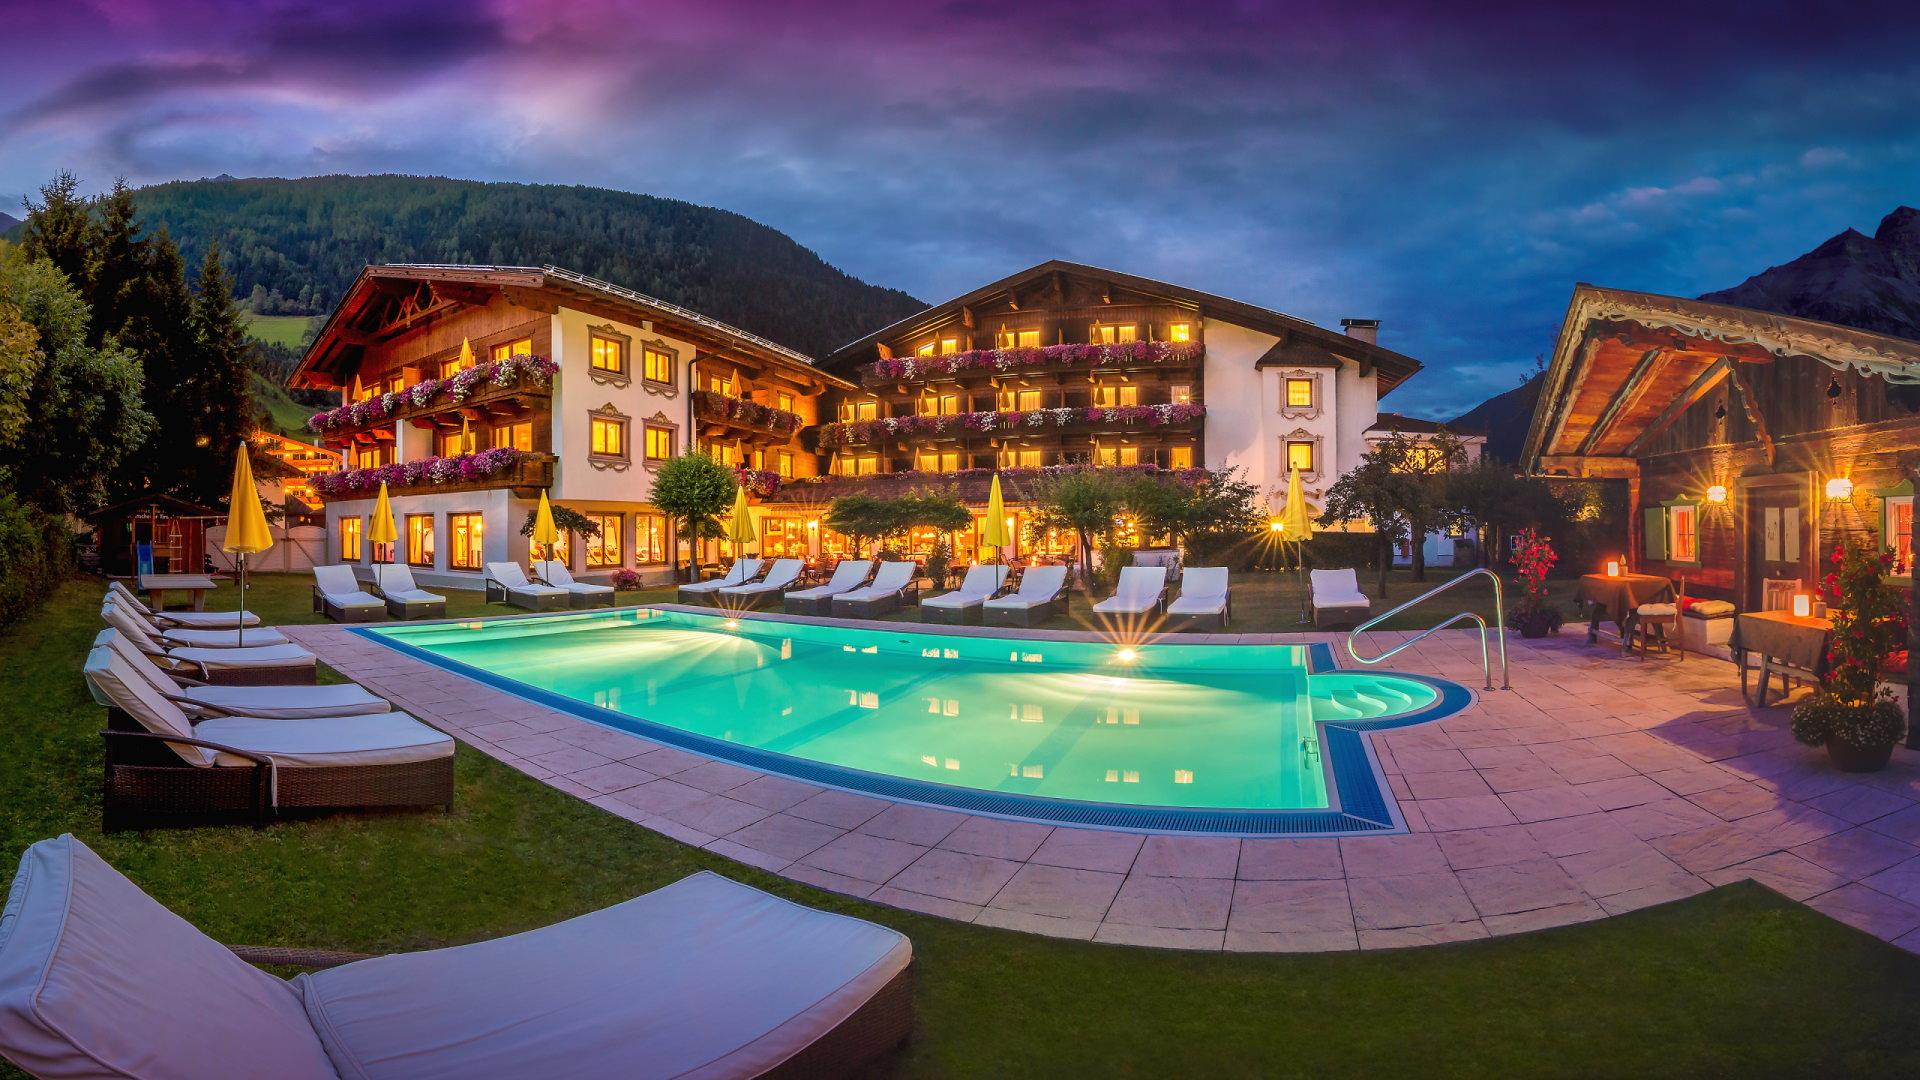 Garden side Alpenhotel Tirolerhof**** Neustift in summer at night